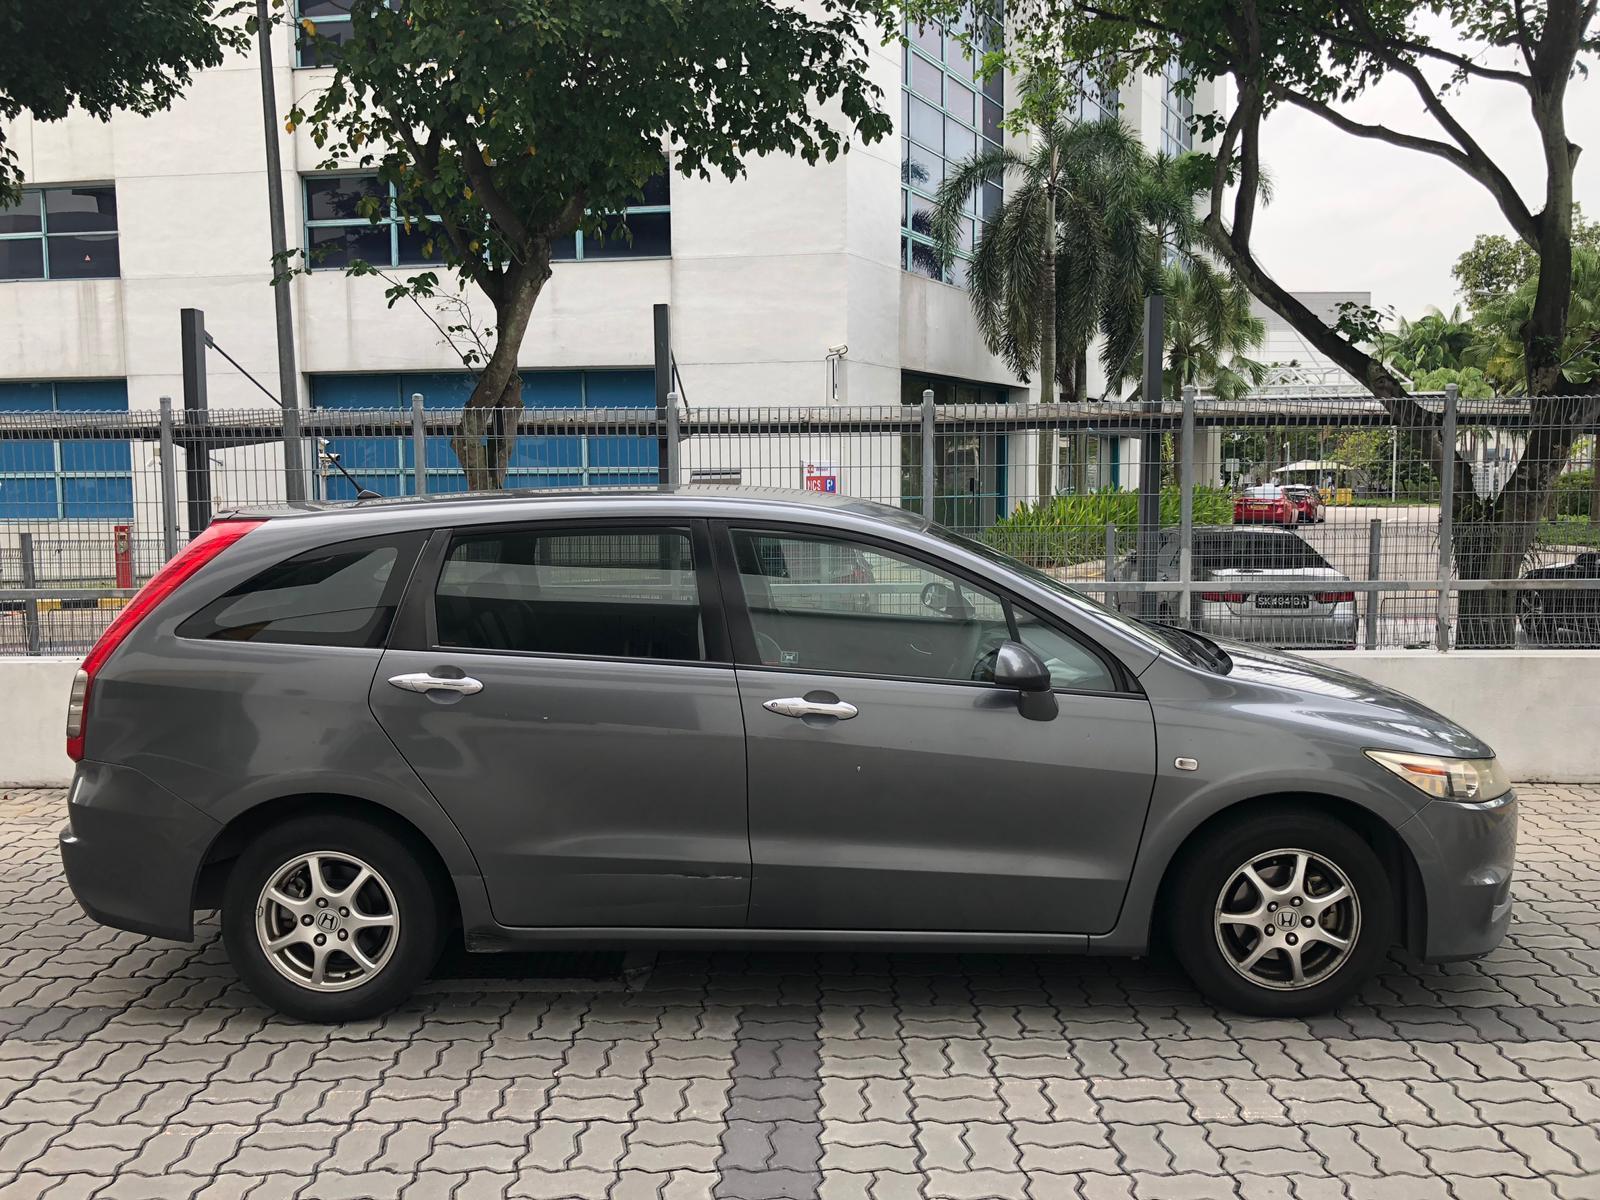 HONDA STREAM ($250 after gojek rebate)cheapest rental toyota altis allion camry hyundai avante conti cars suitable for grab gojek n personal use.